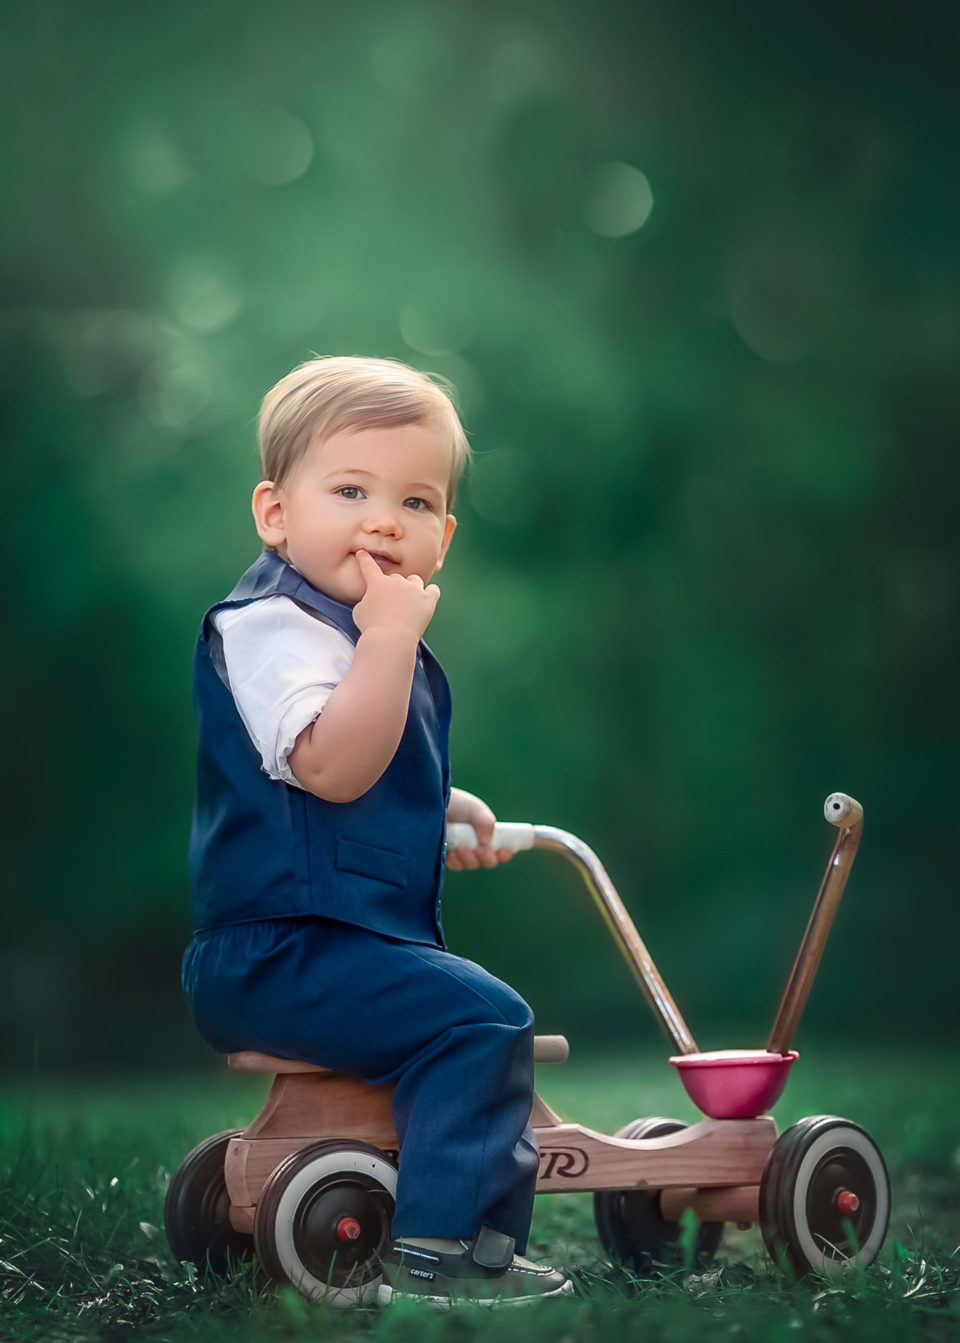 cedar rapids children's photographer